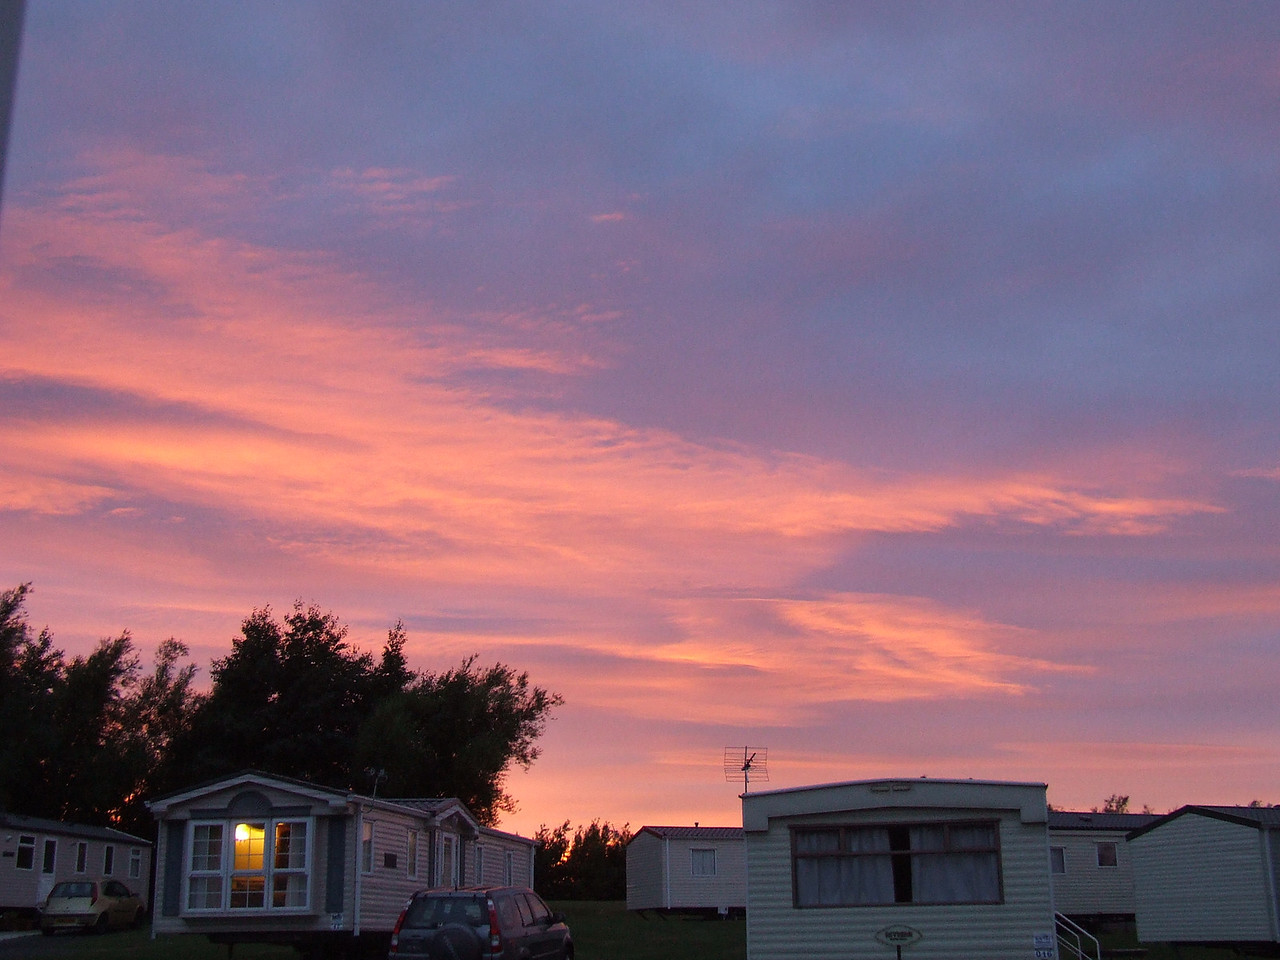 Sunset over Haggerston Castle